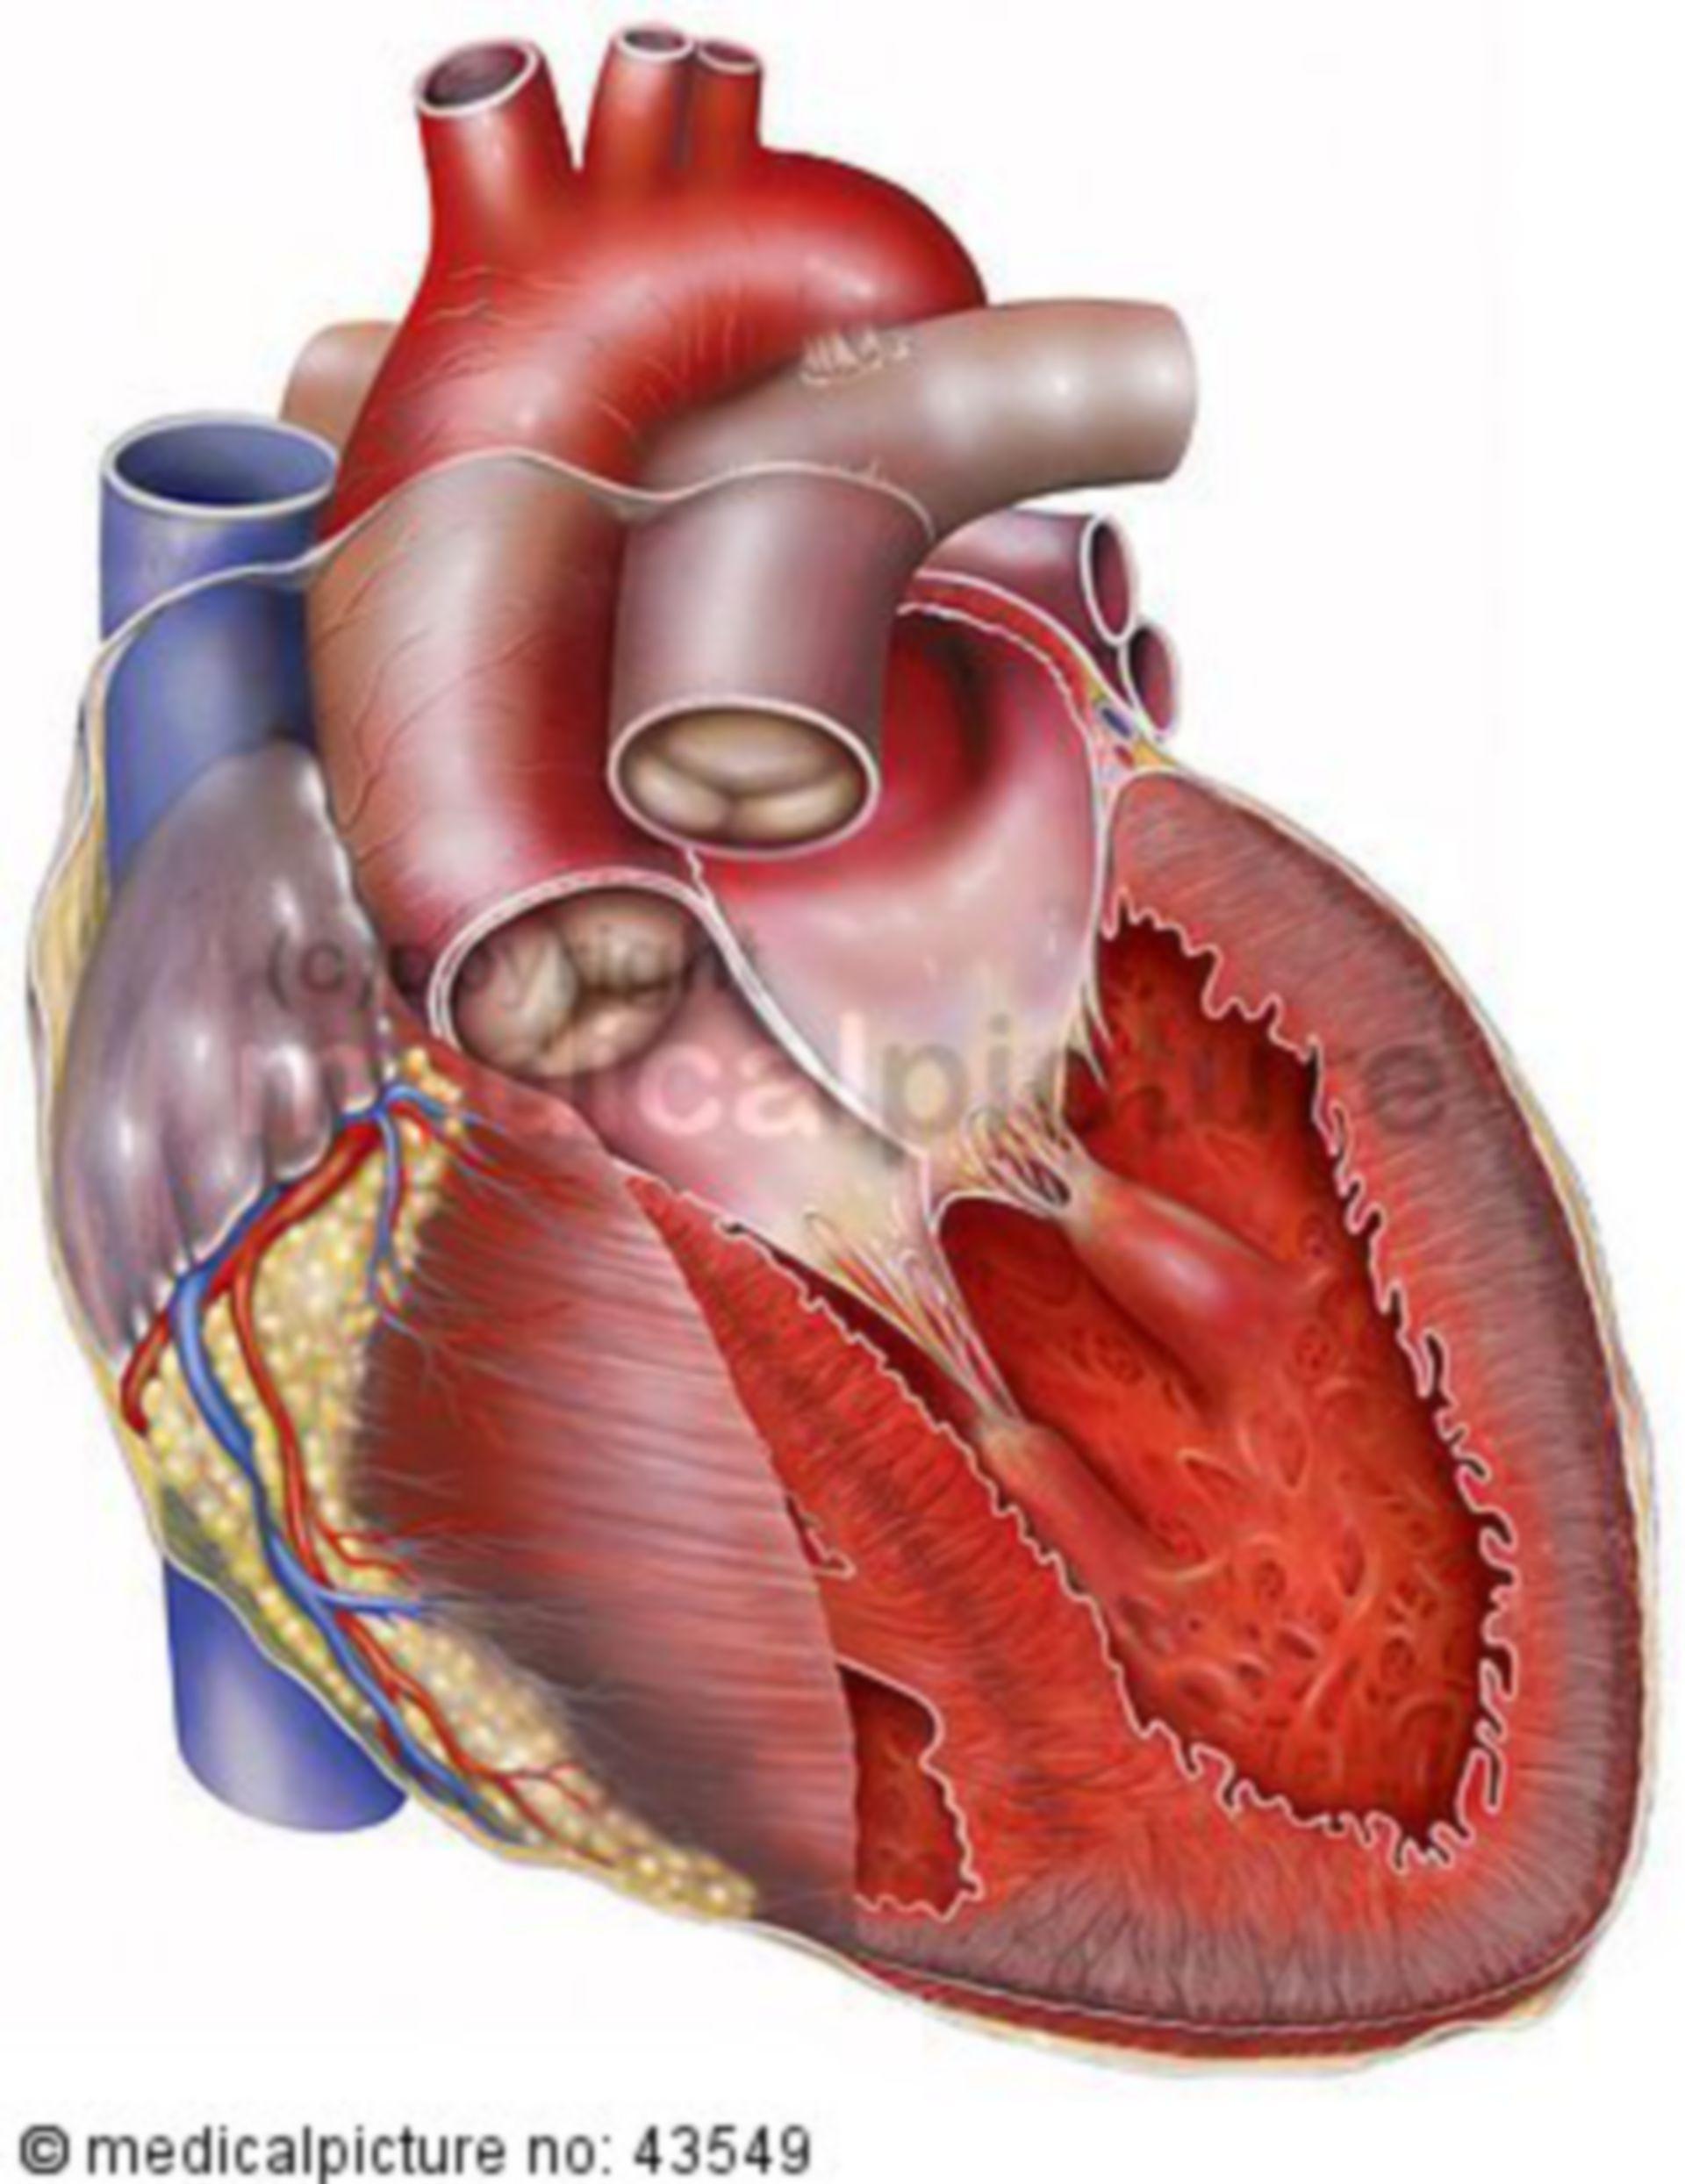 Heart failure, heart in cross-section